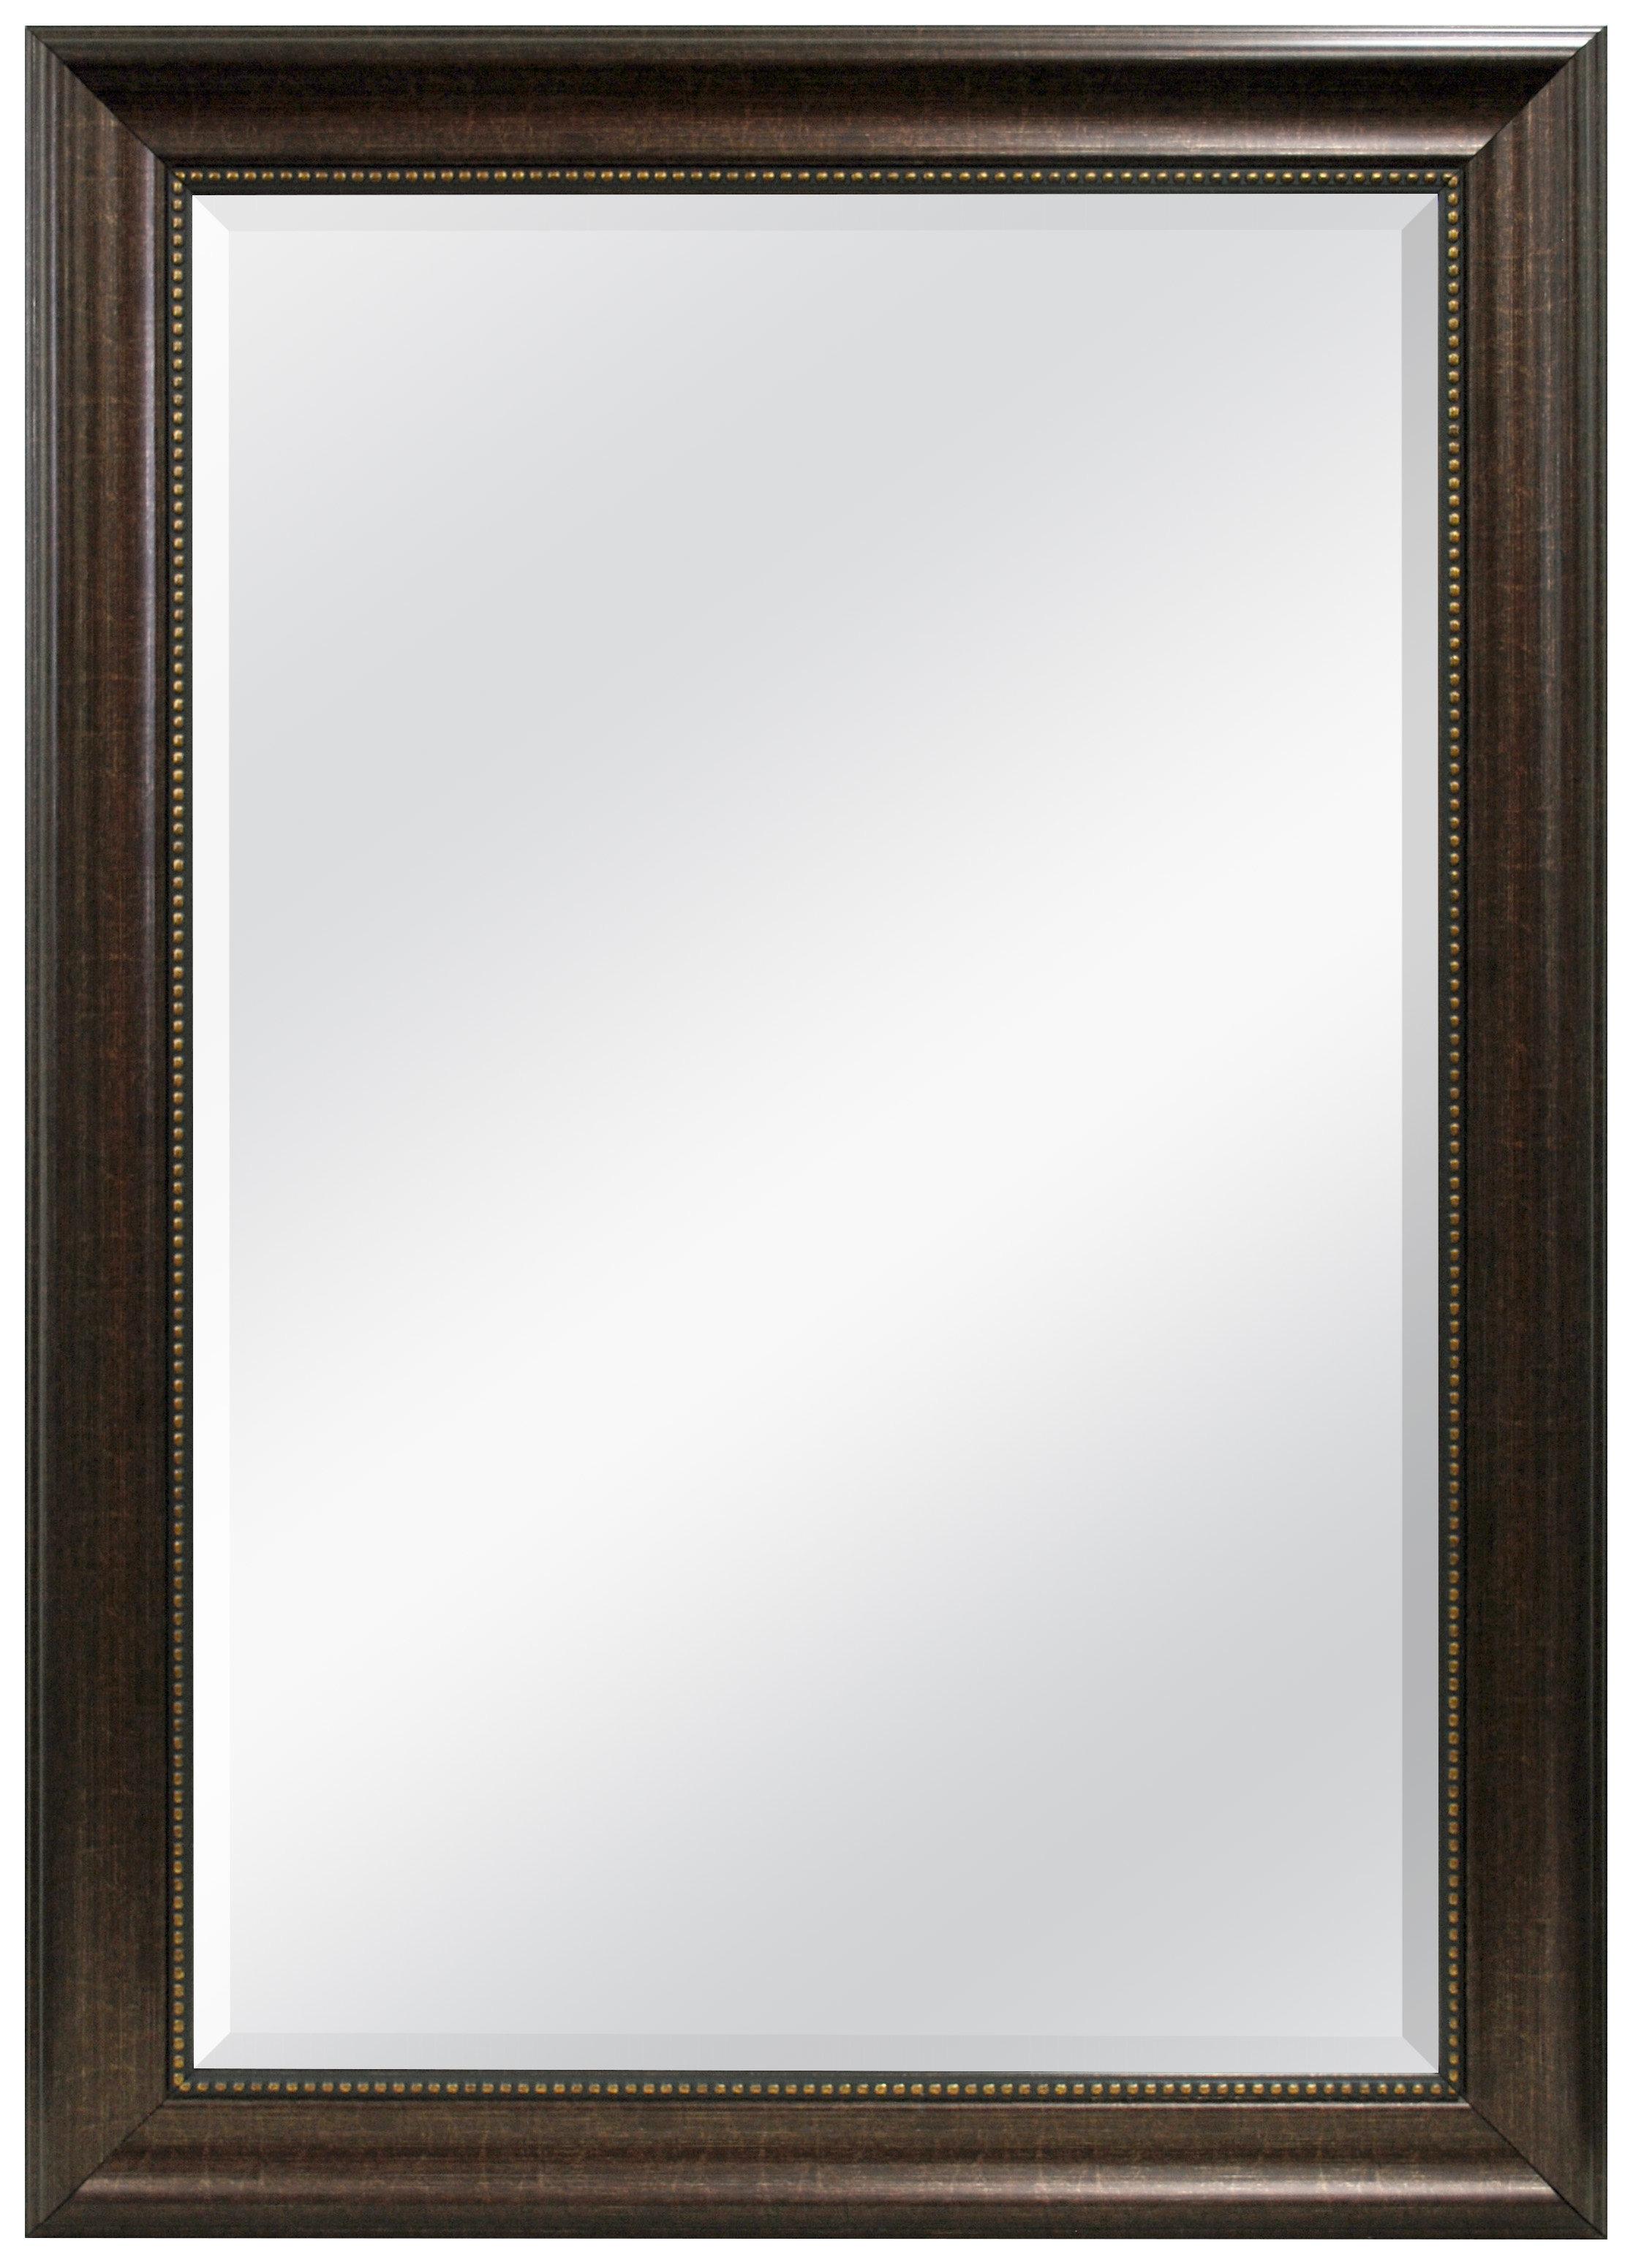 Vassallo Beaded Bronze Beveled Wall Mirror Inside Vassallo Beaded Bronze Beveled Wall Mirrors (Image 20 of 20)